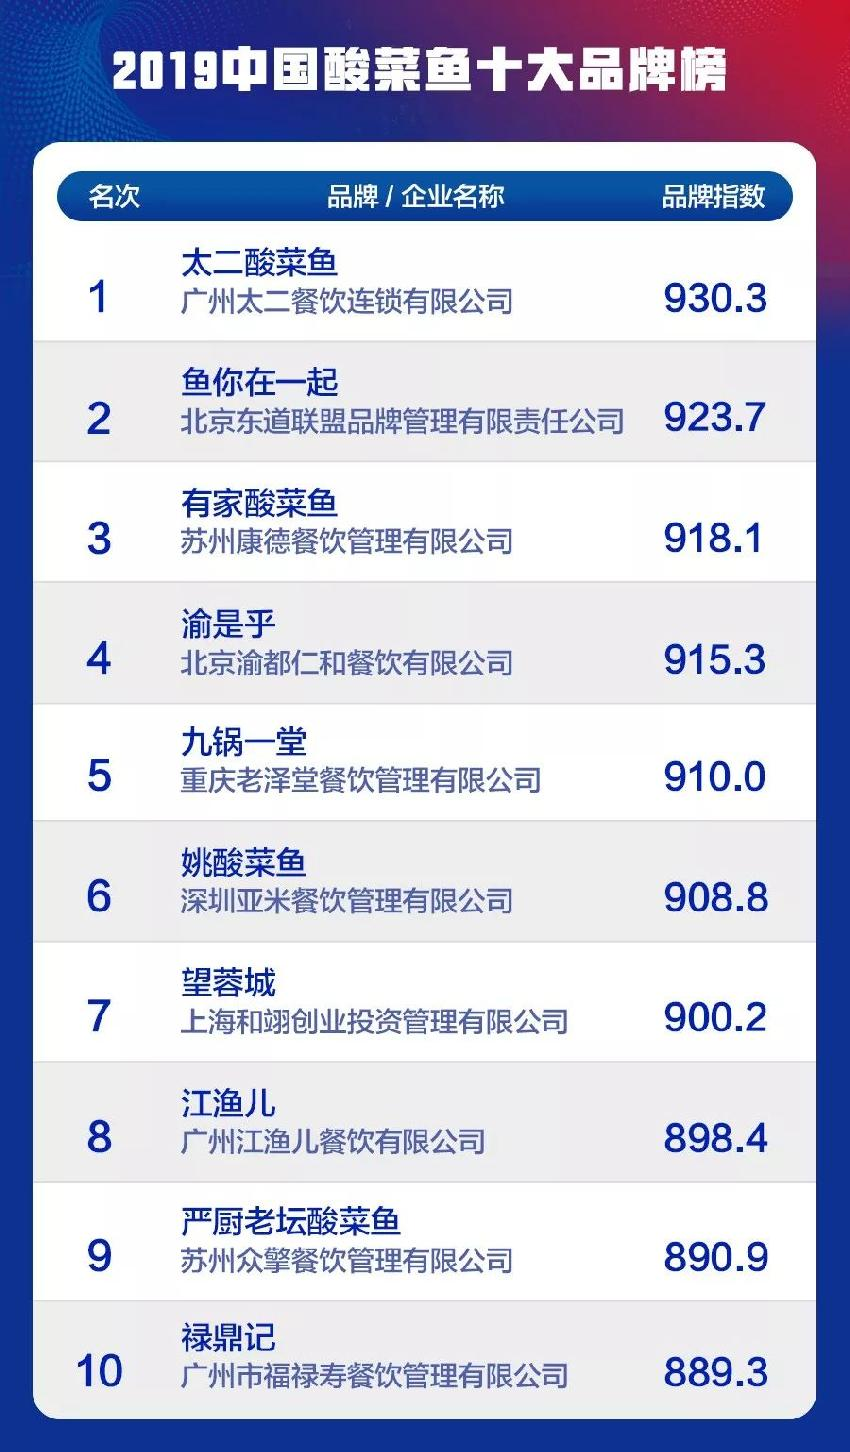 2019ysb88易胜博十大品牌榜单揭晓,鱼你在一起领衔ysb88易胜博快餐市场